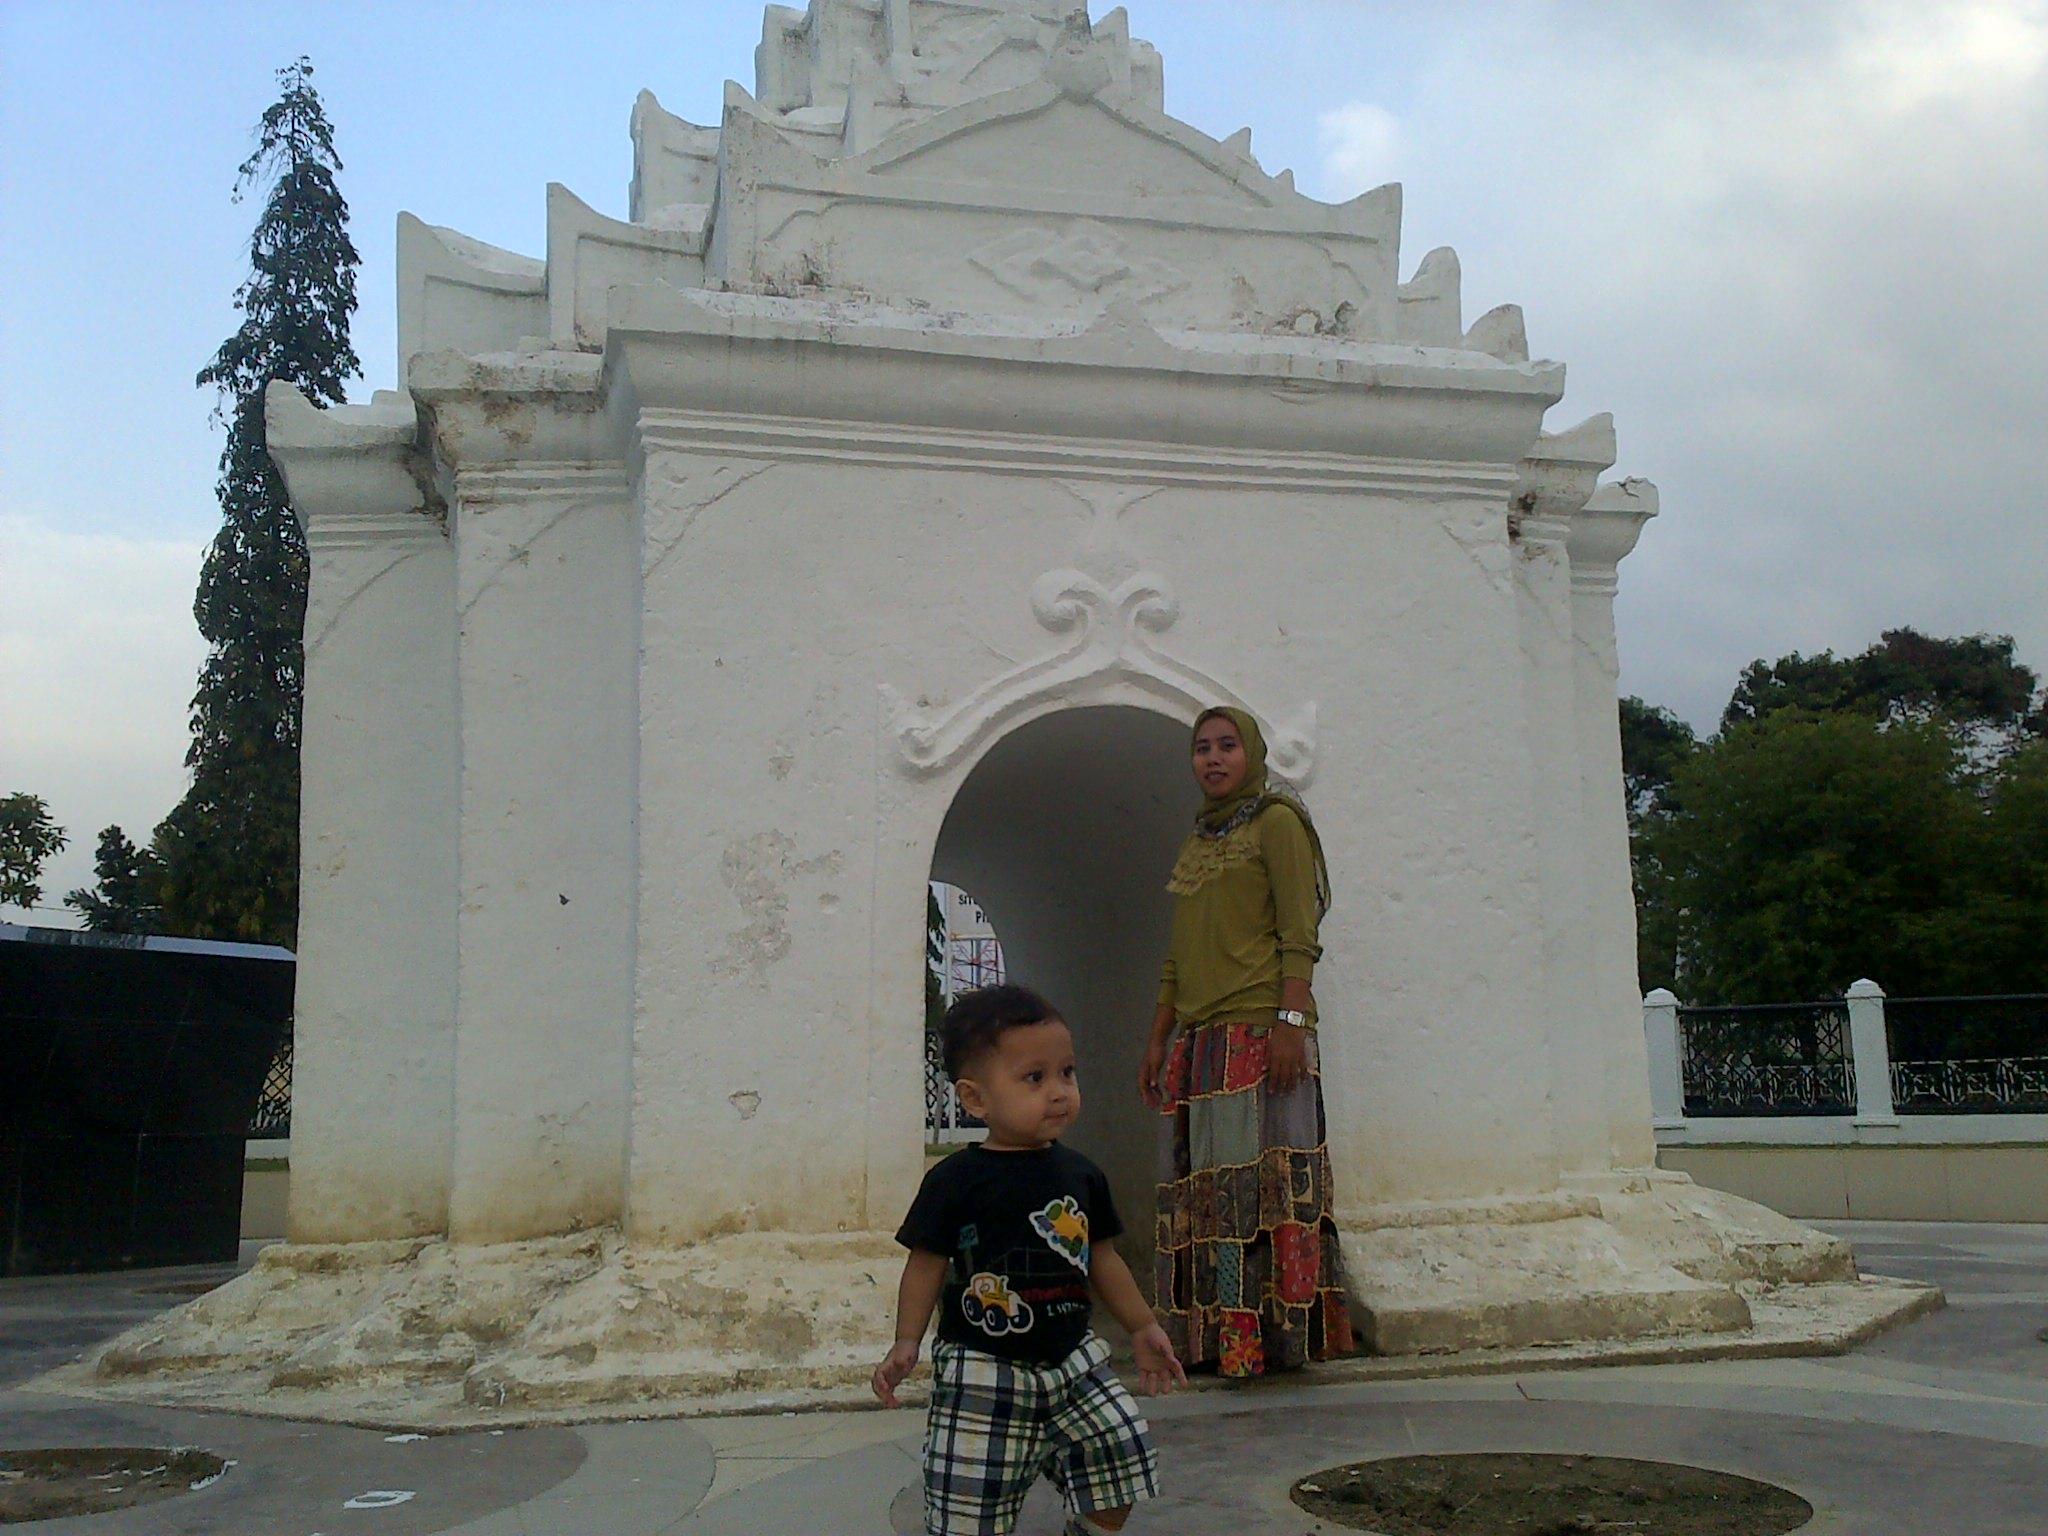 Banda Aceh Asal Mula Rimbakuta Situs Pinto Khop Taman Putroe